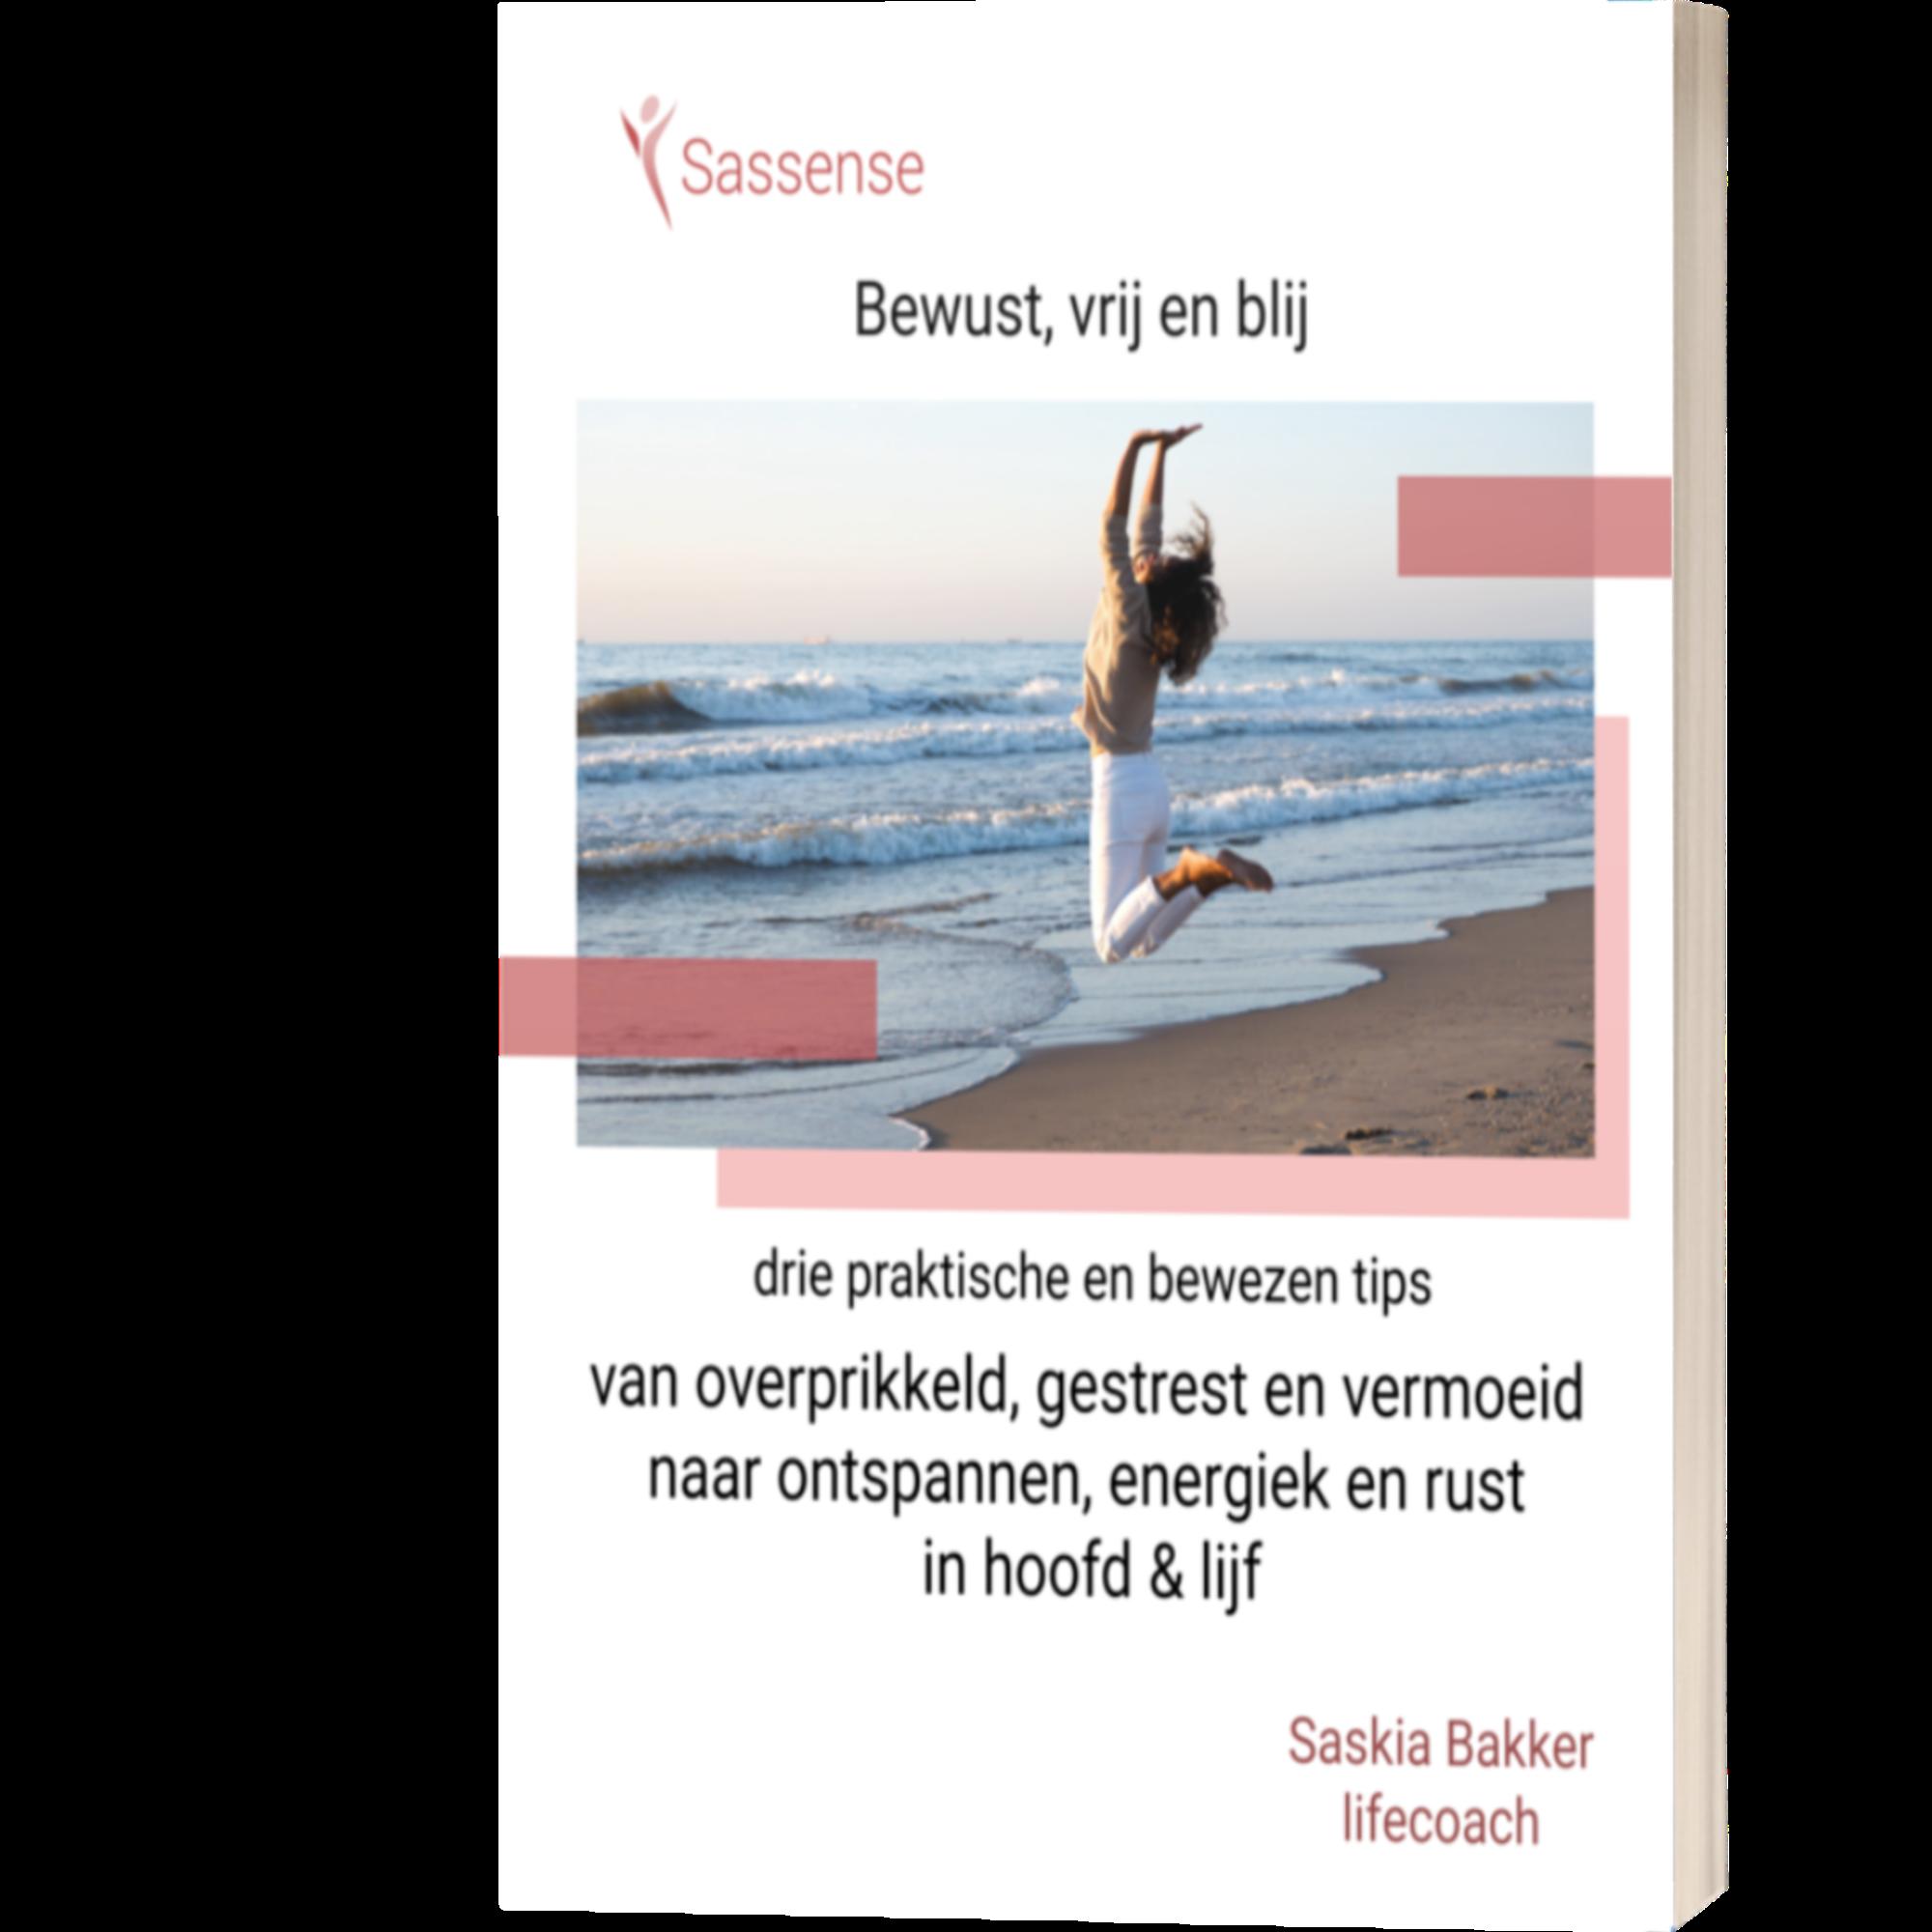 e-book Sassense